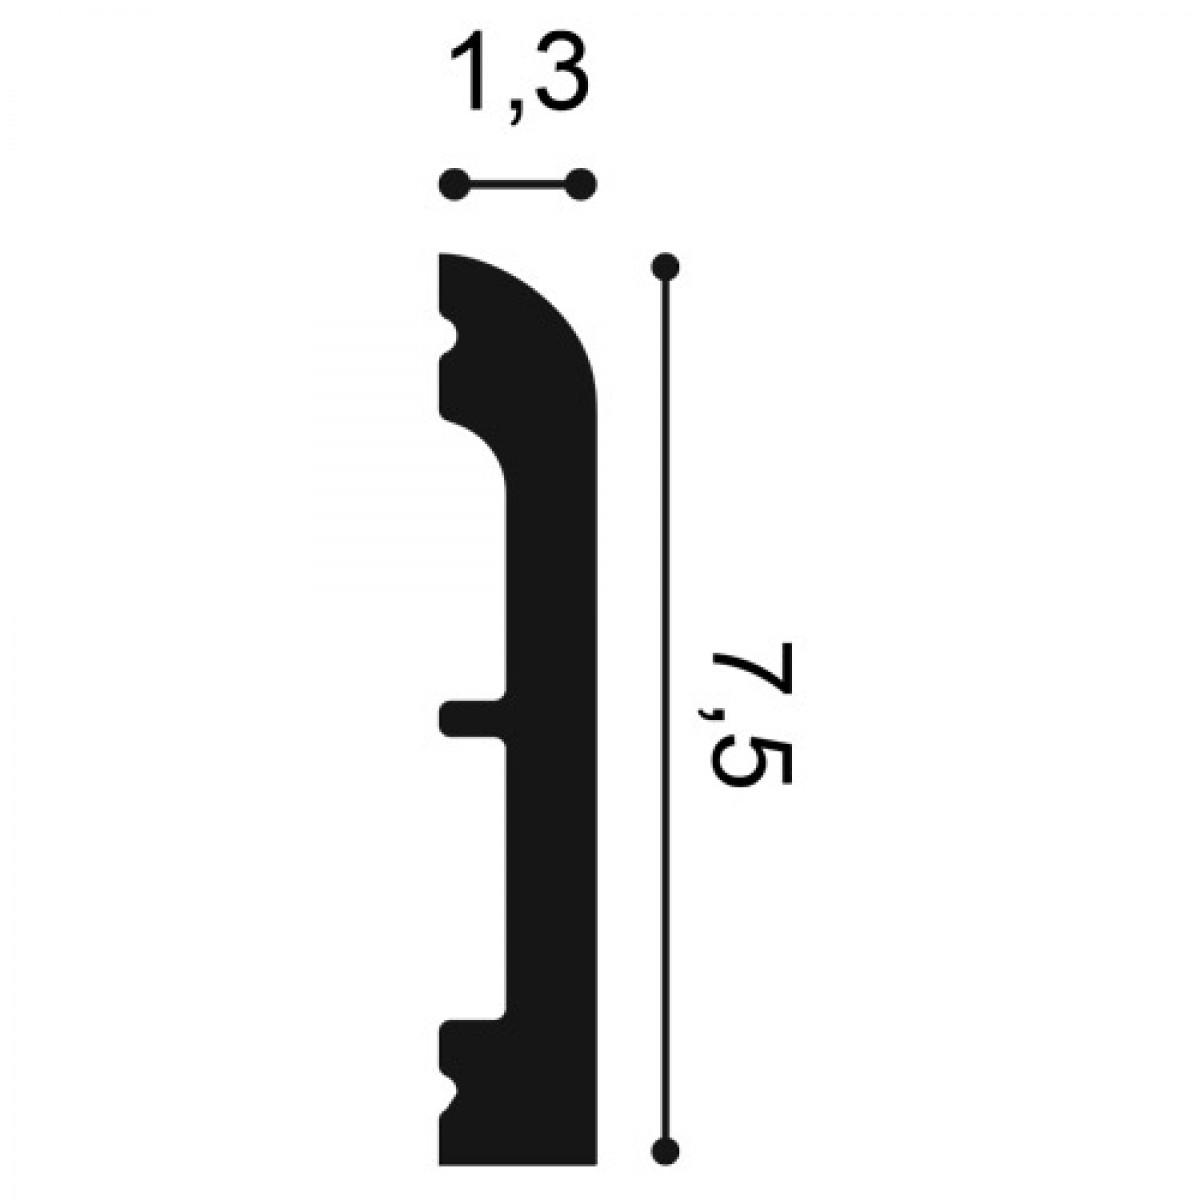 Plinta Flex Axxent SX184F, Dimensiuni: 200 X 11 X 1.3 cm, Orac Decor